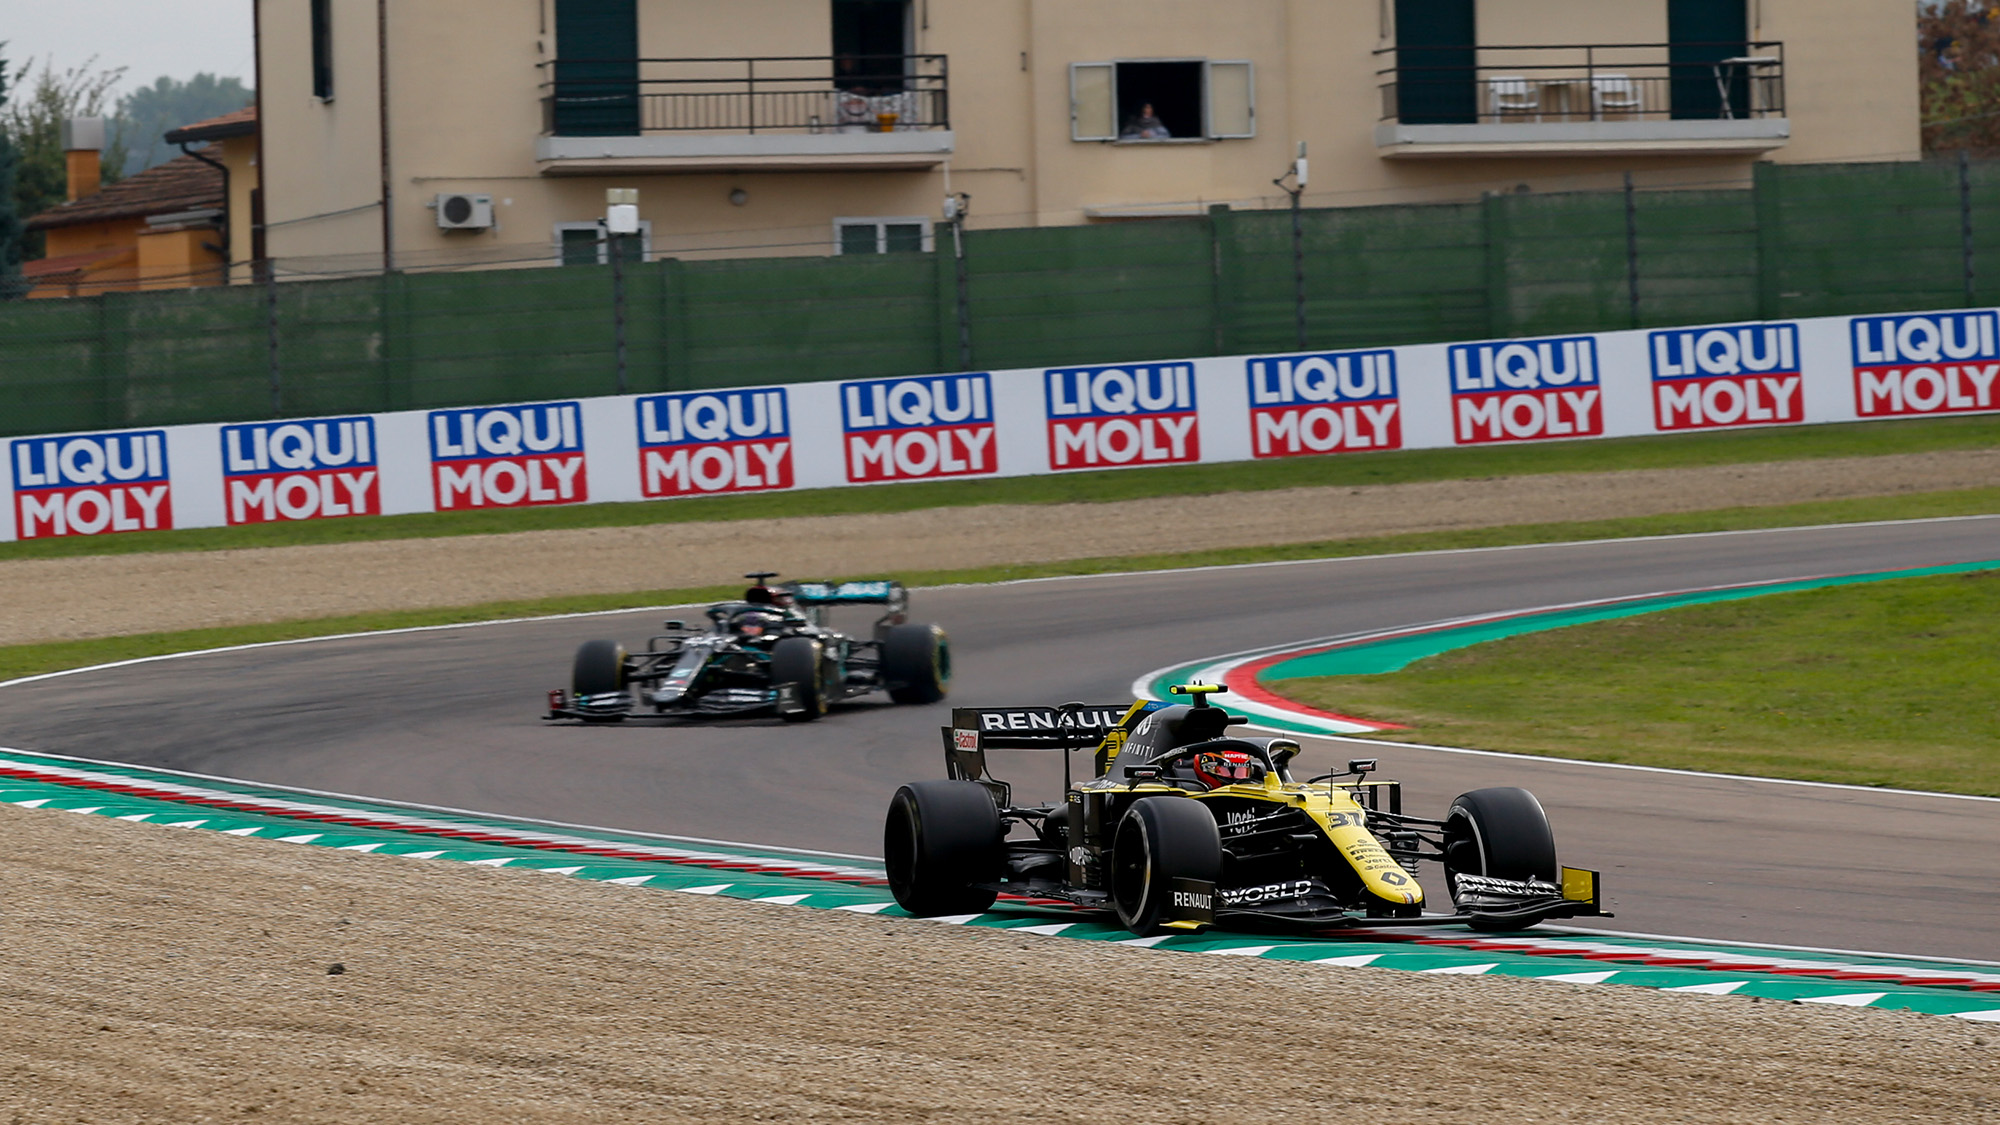 Lewis Hamilton comes up to lap the renault of Esteban Ocon at the 2020 F1 Emilia Romagna Grand Prix